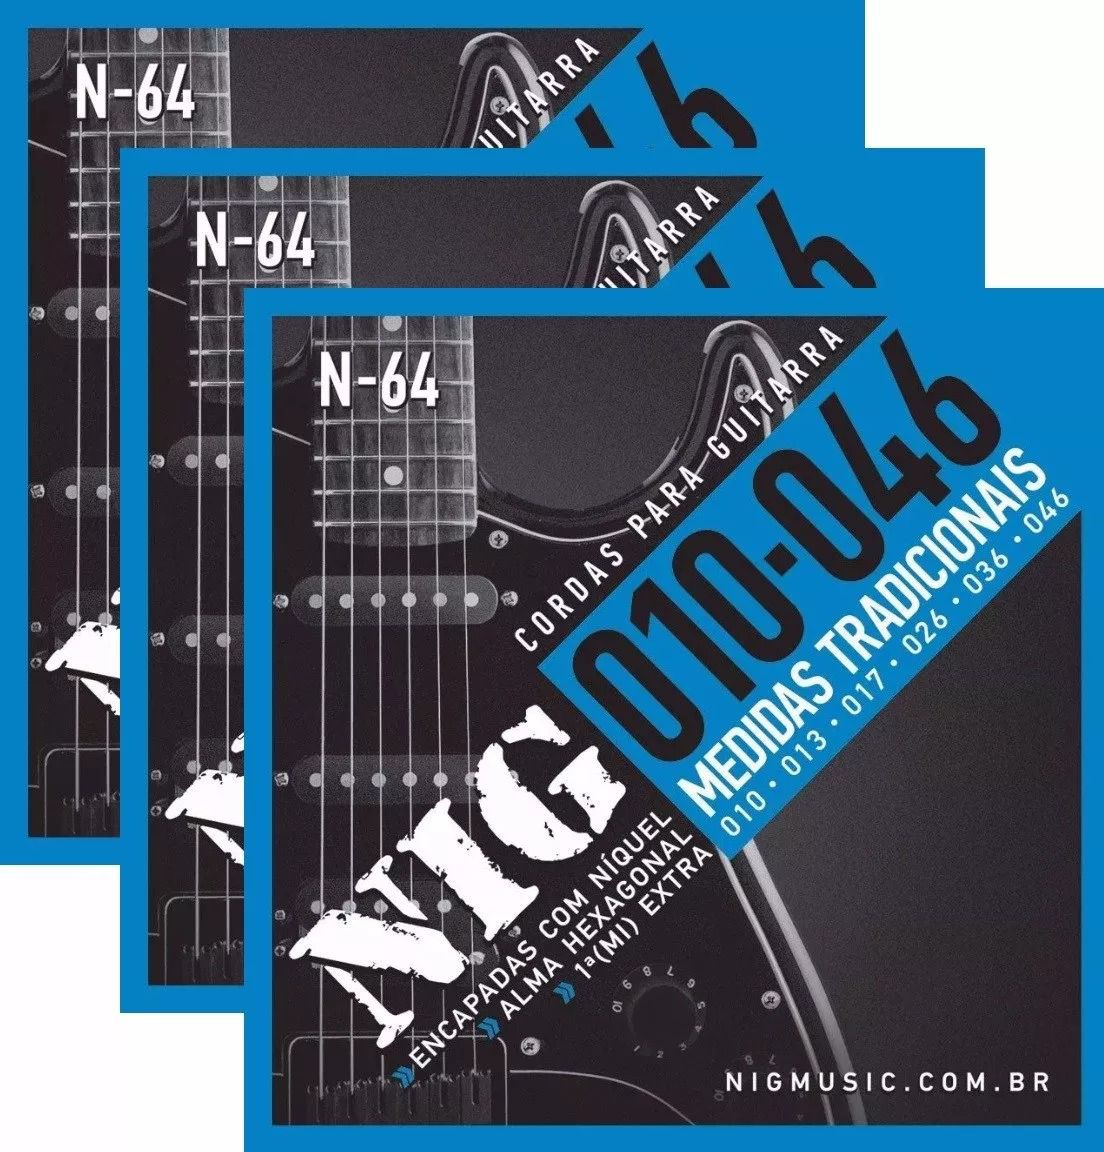 Kit 3 Jogos Encordoamento Nig Guitarra 010 046 N64 N-64